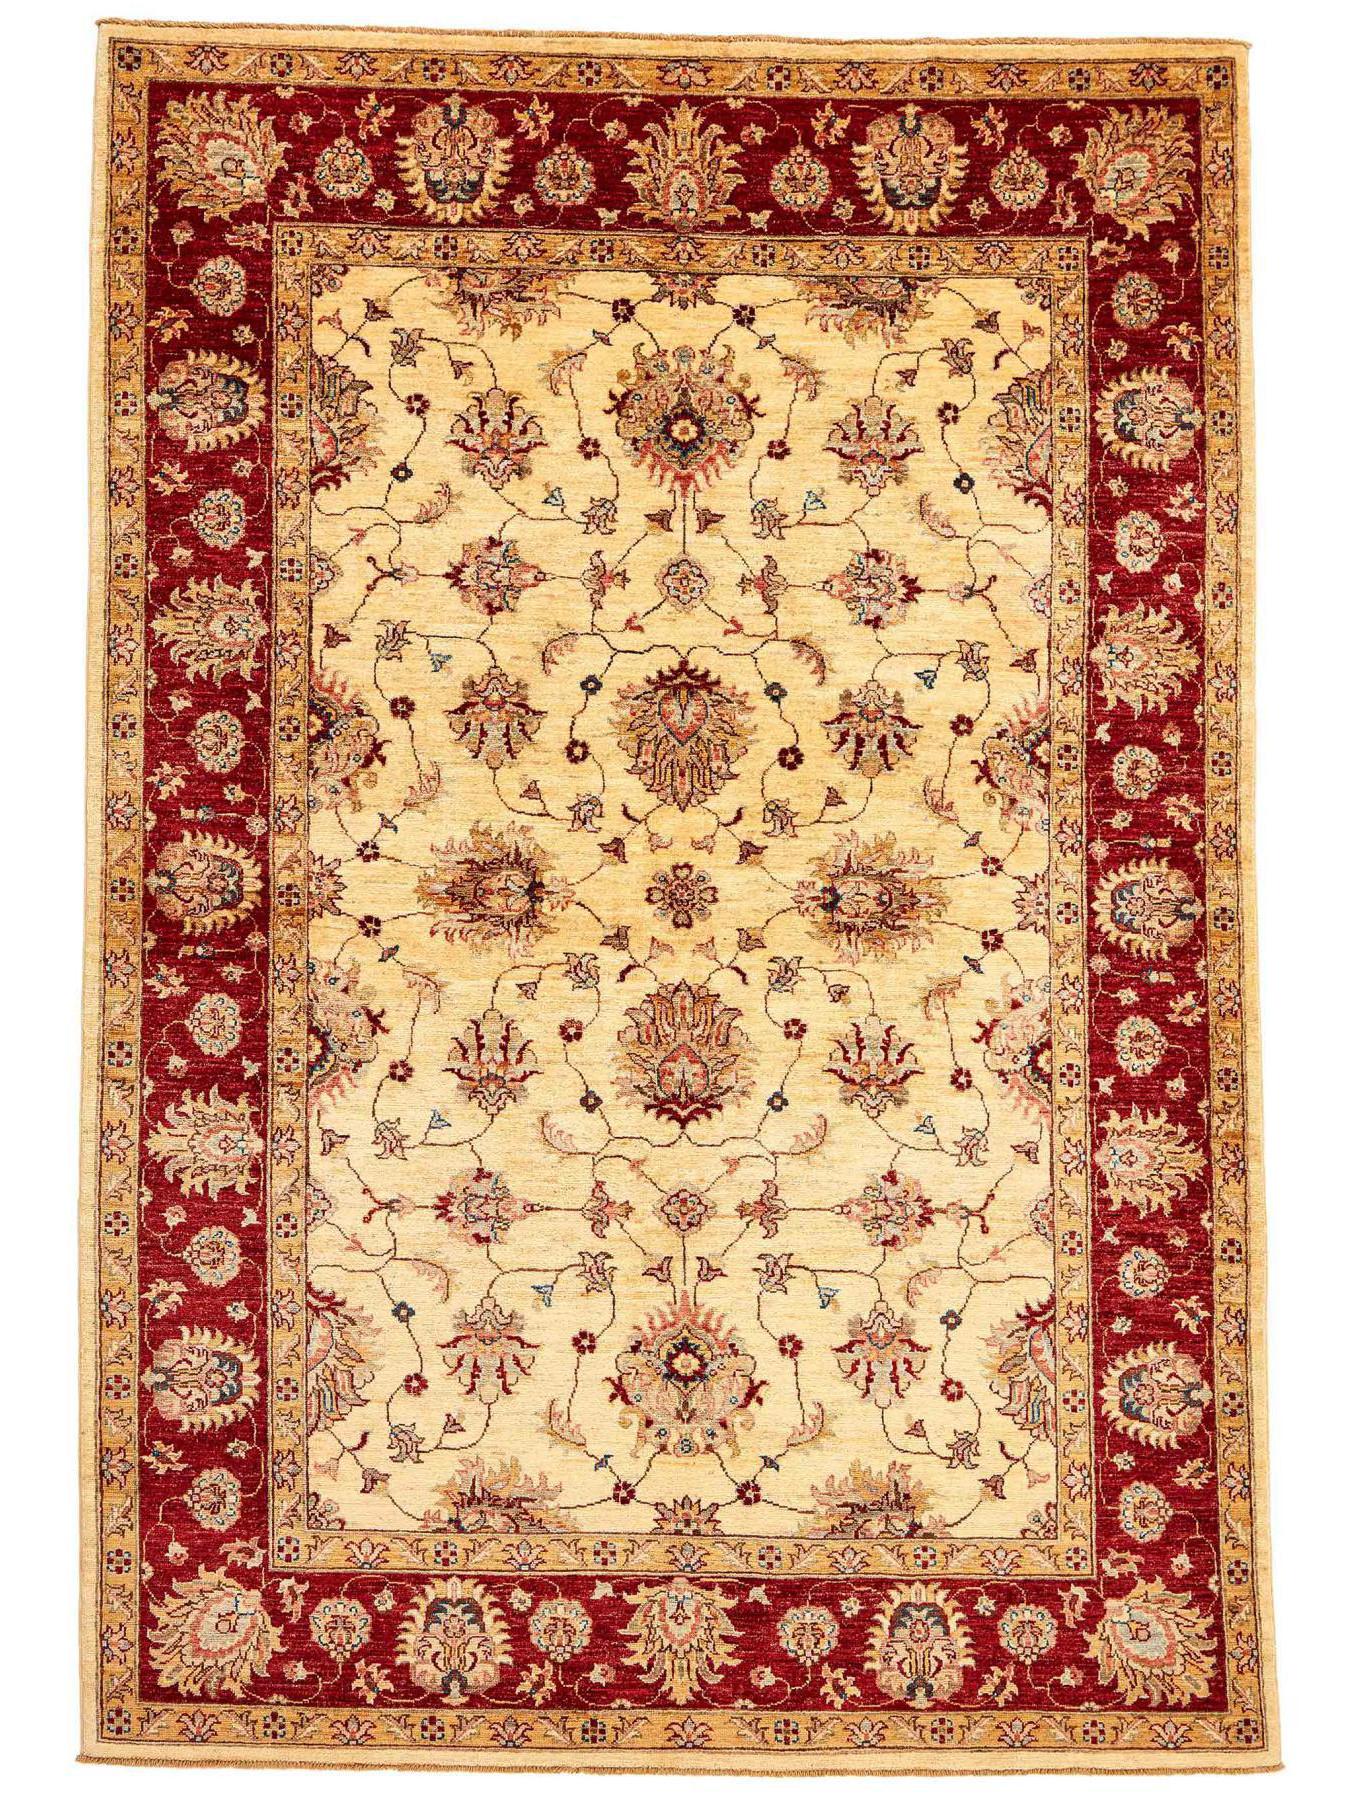 Ziegler carpets - Ghaznavi neo-classic Fine